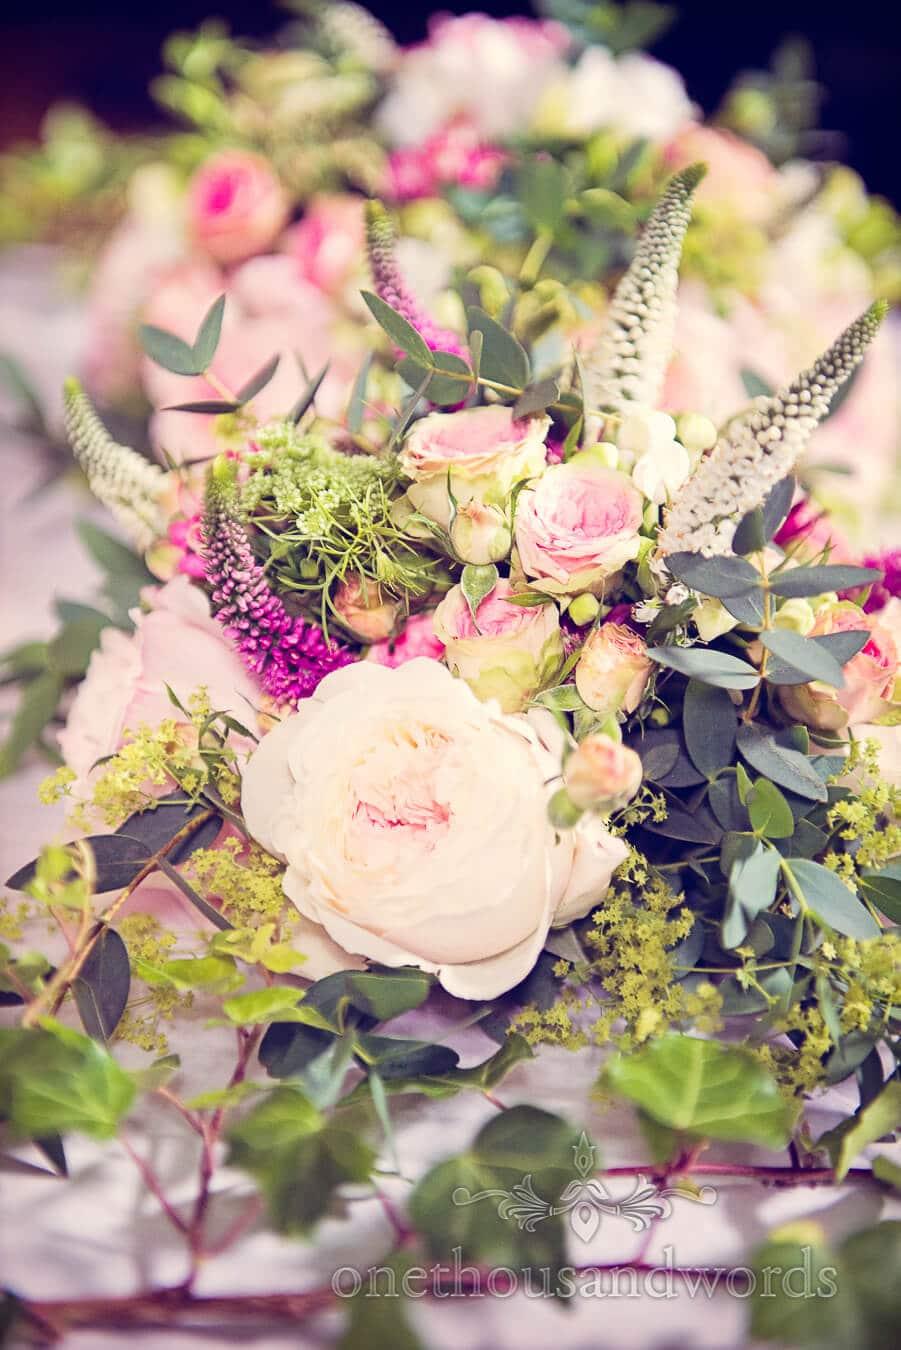 Countryside theme wedding flowers at Dorset Home Wedding